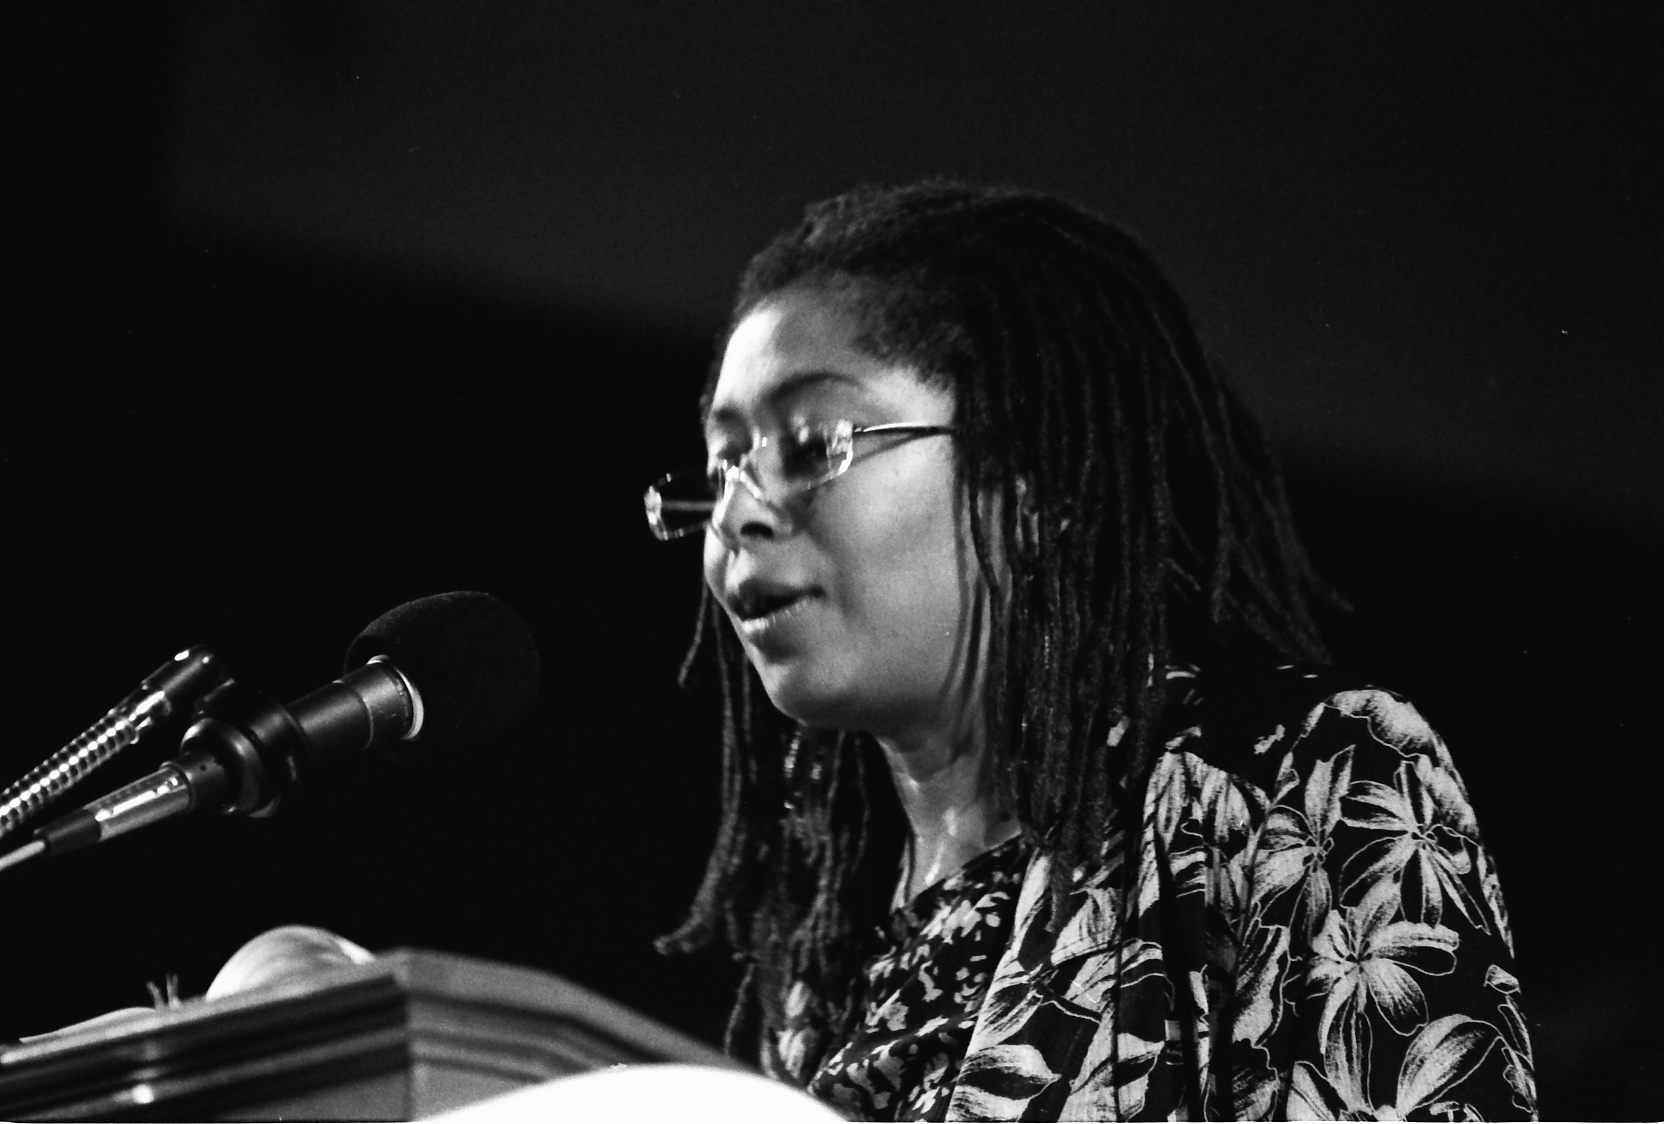 Alice Walker, Miami Bookfair International, 1989